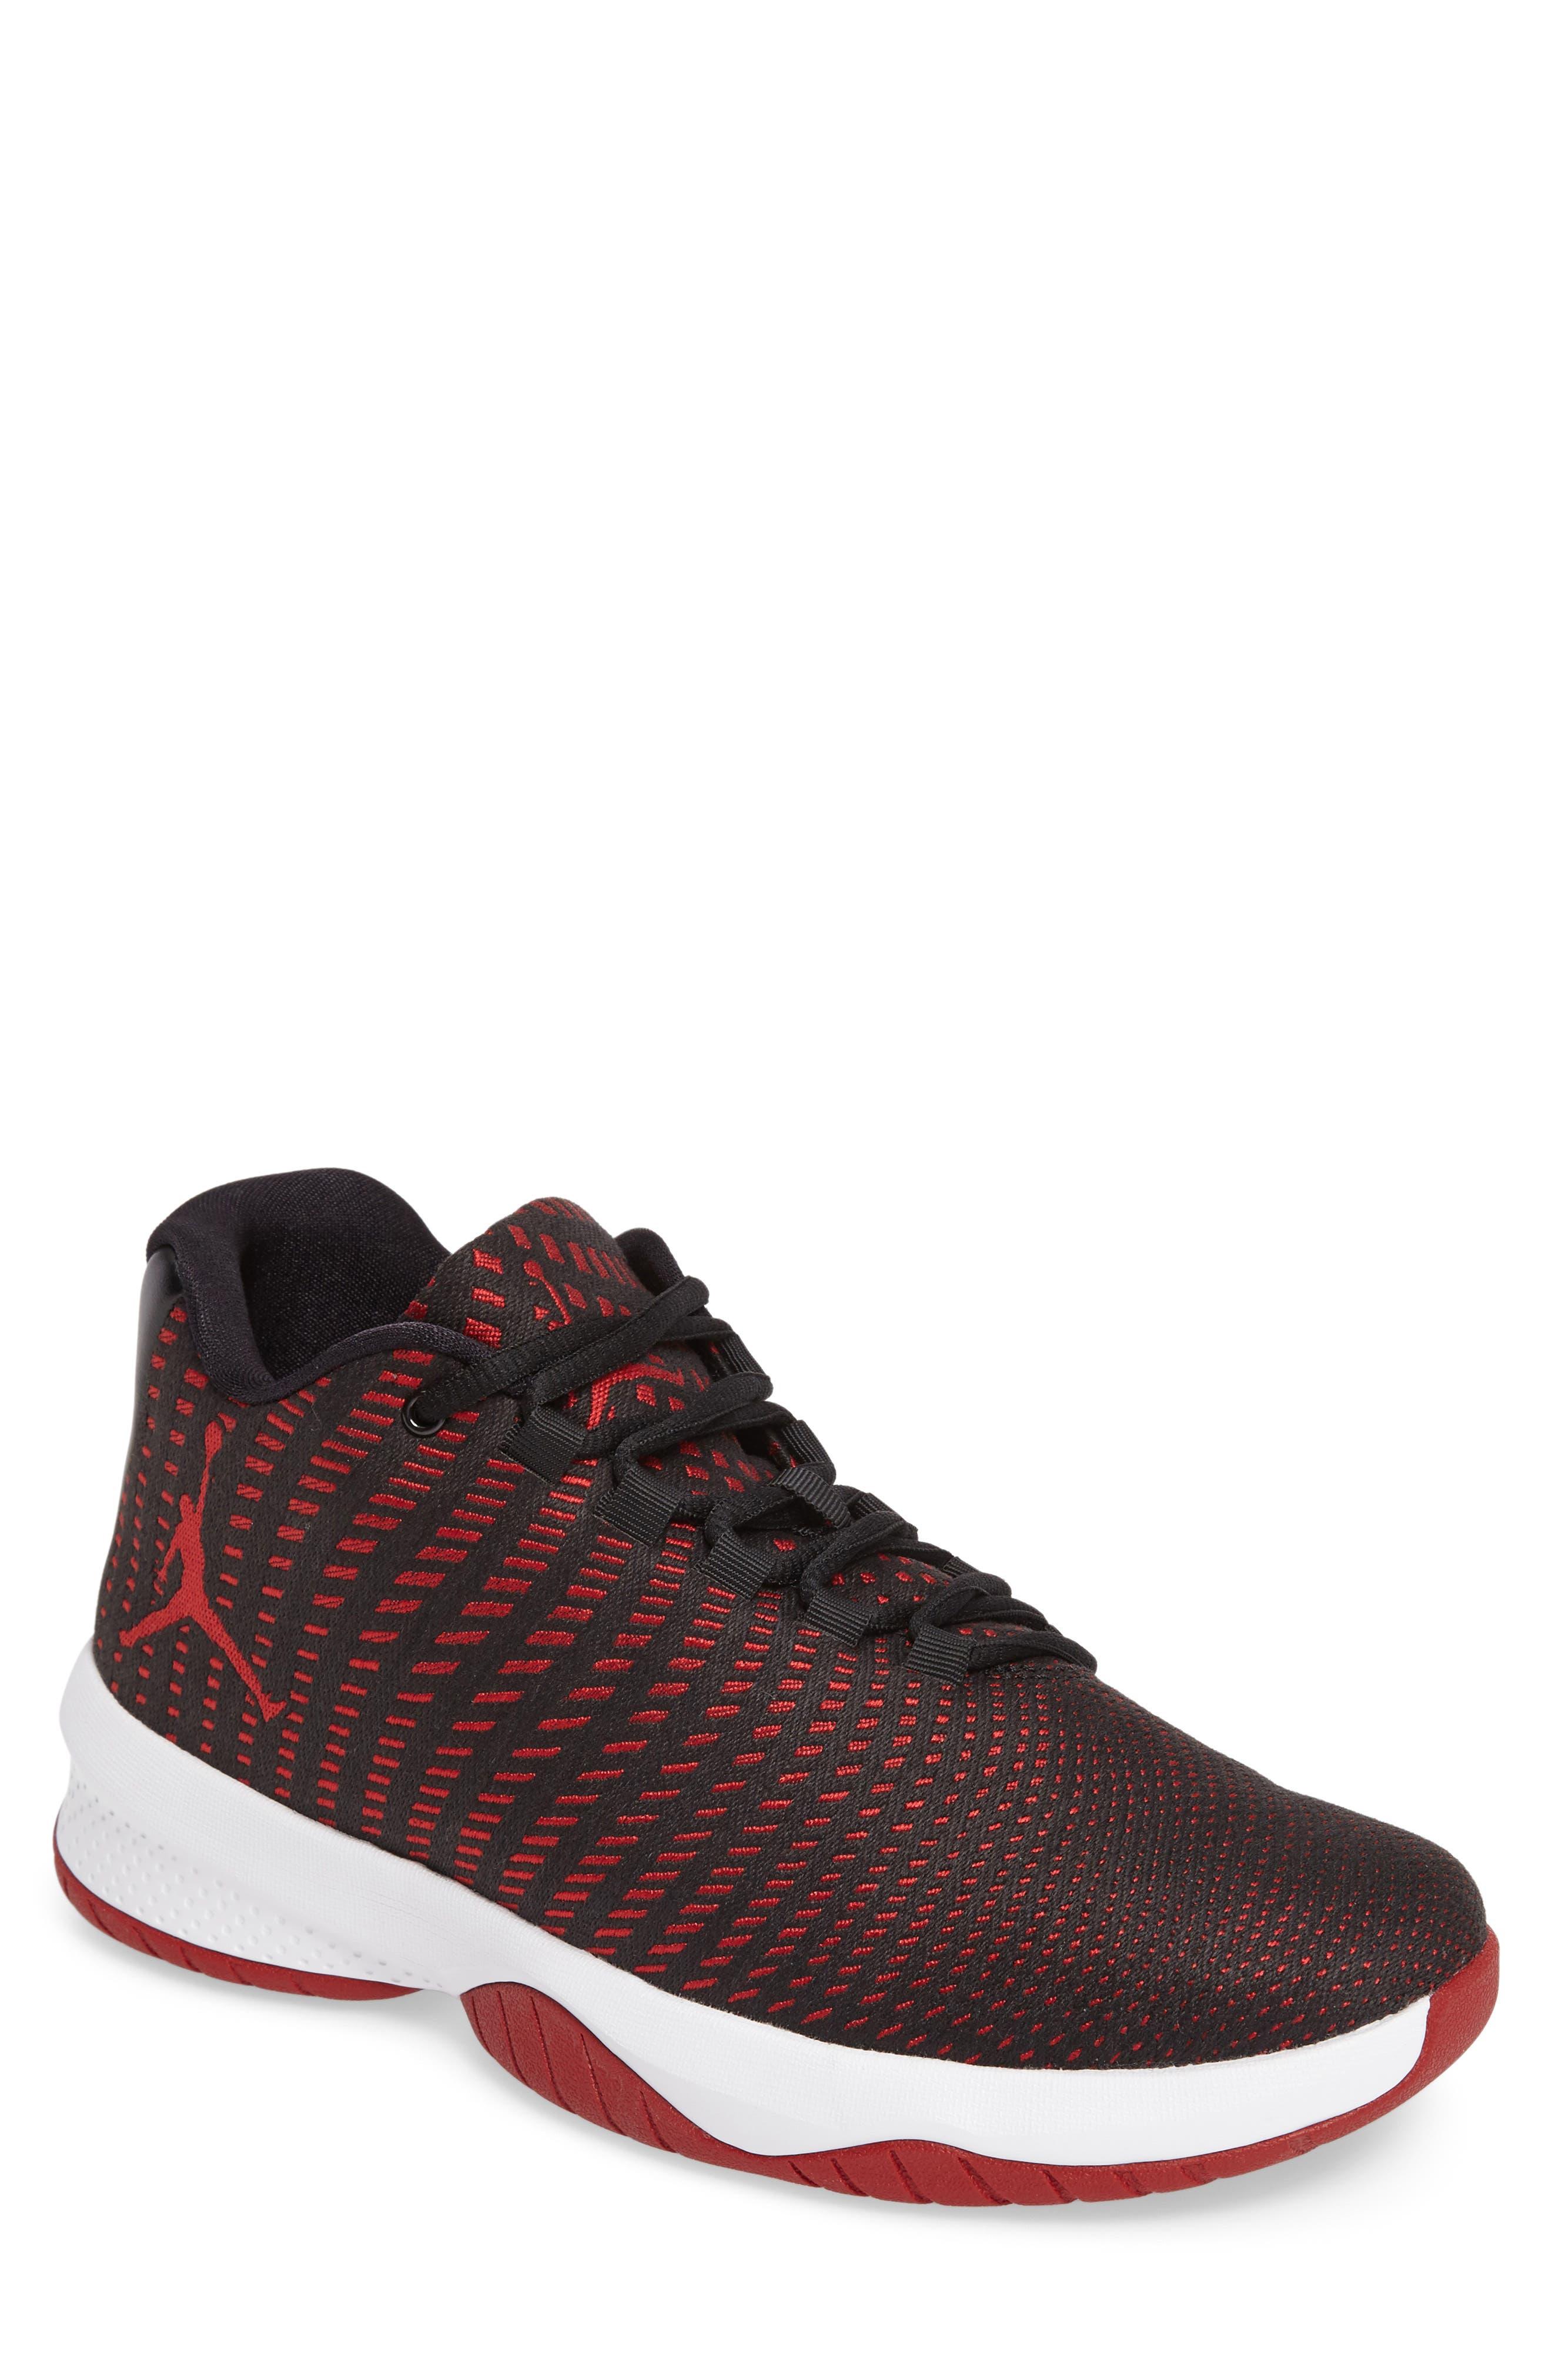 Jordan B. Fly Basketball Shoe, Main, color, 002